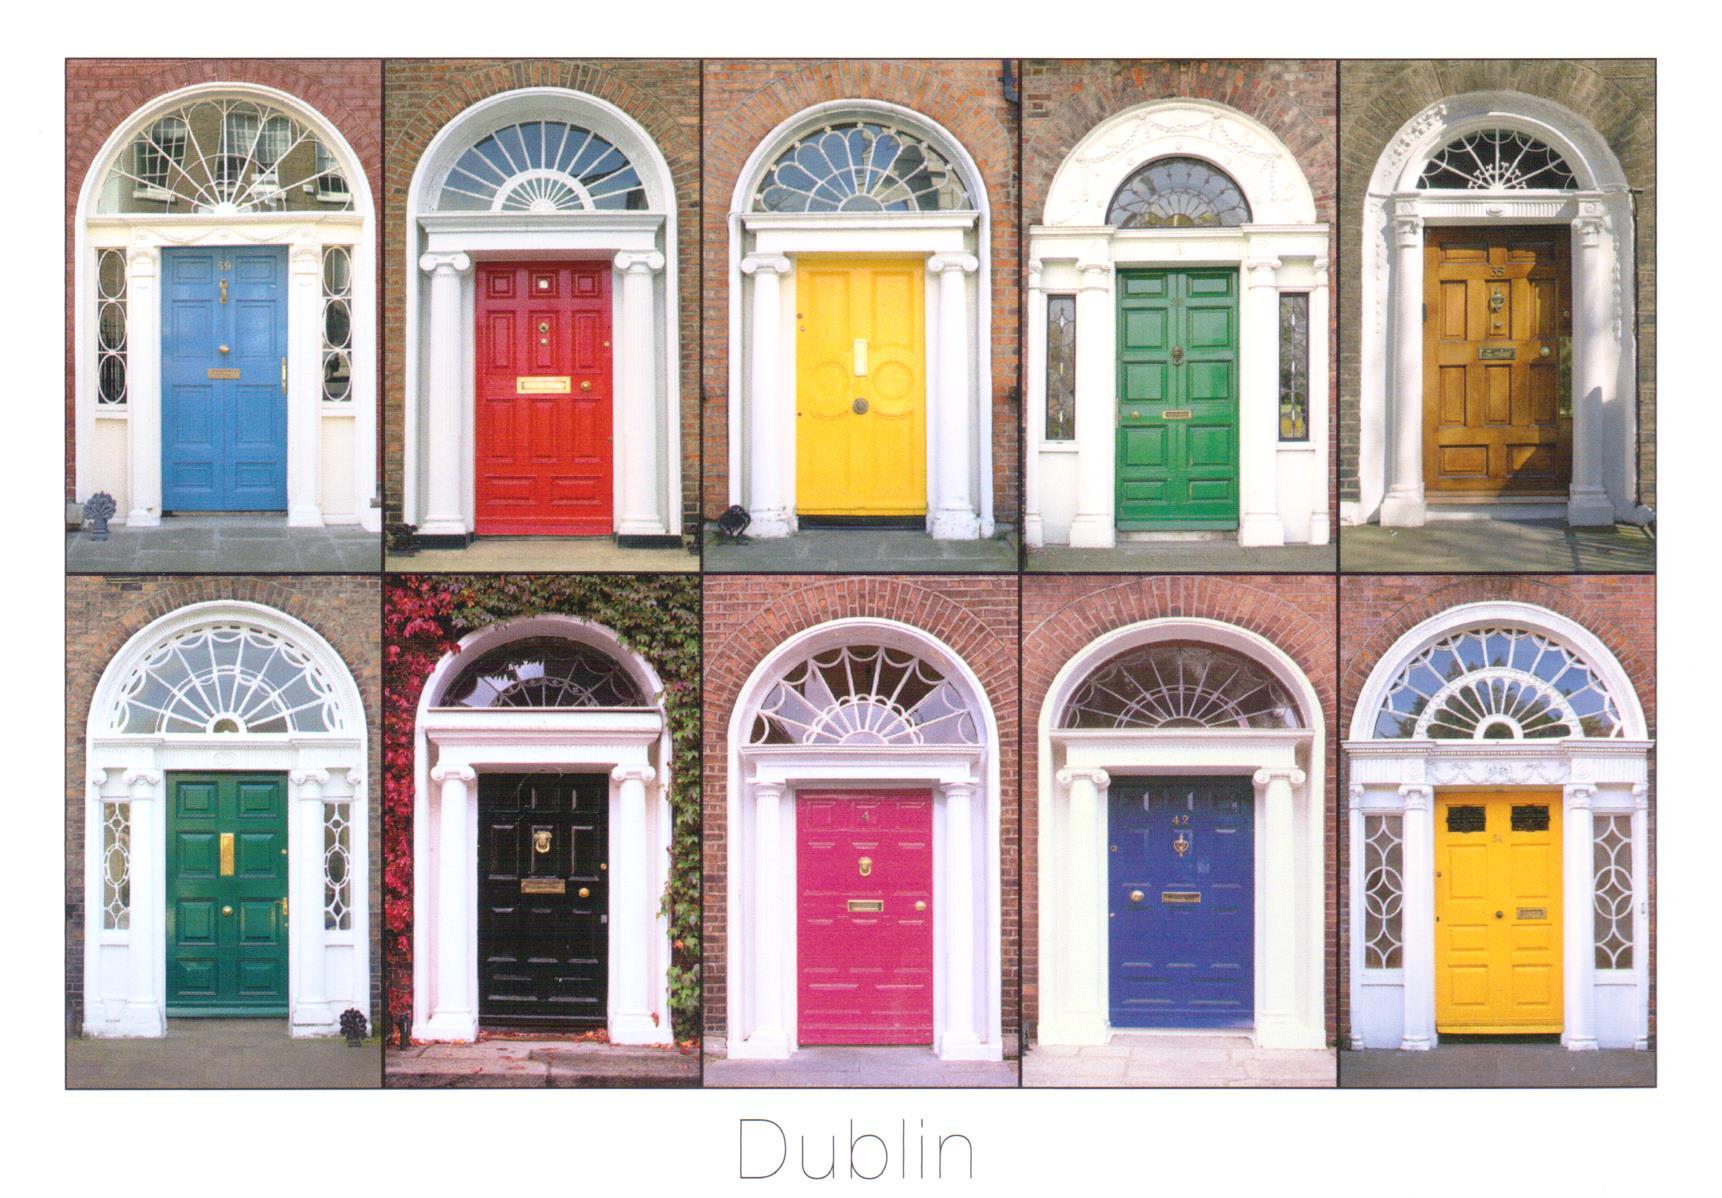 Doors of Dublin  sc 1 st  Have Bag Will Travel - WordPress.com & Ireland The Doors of Dublin   Have Bag Will Travel